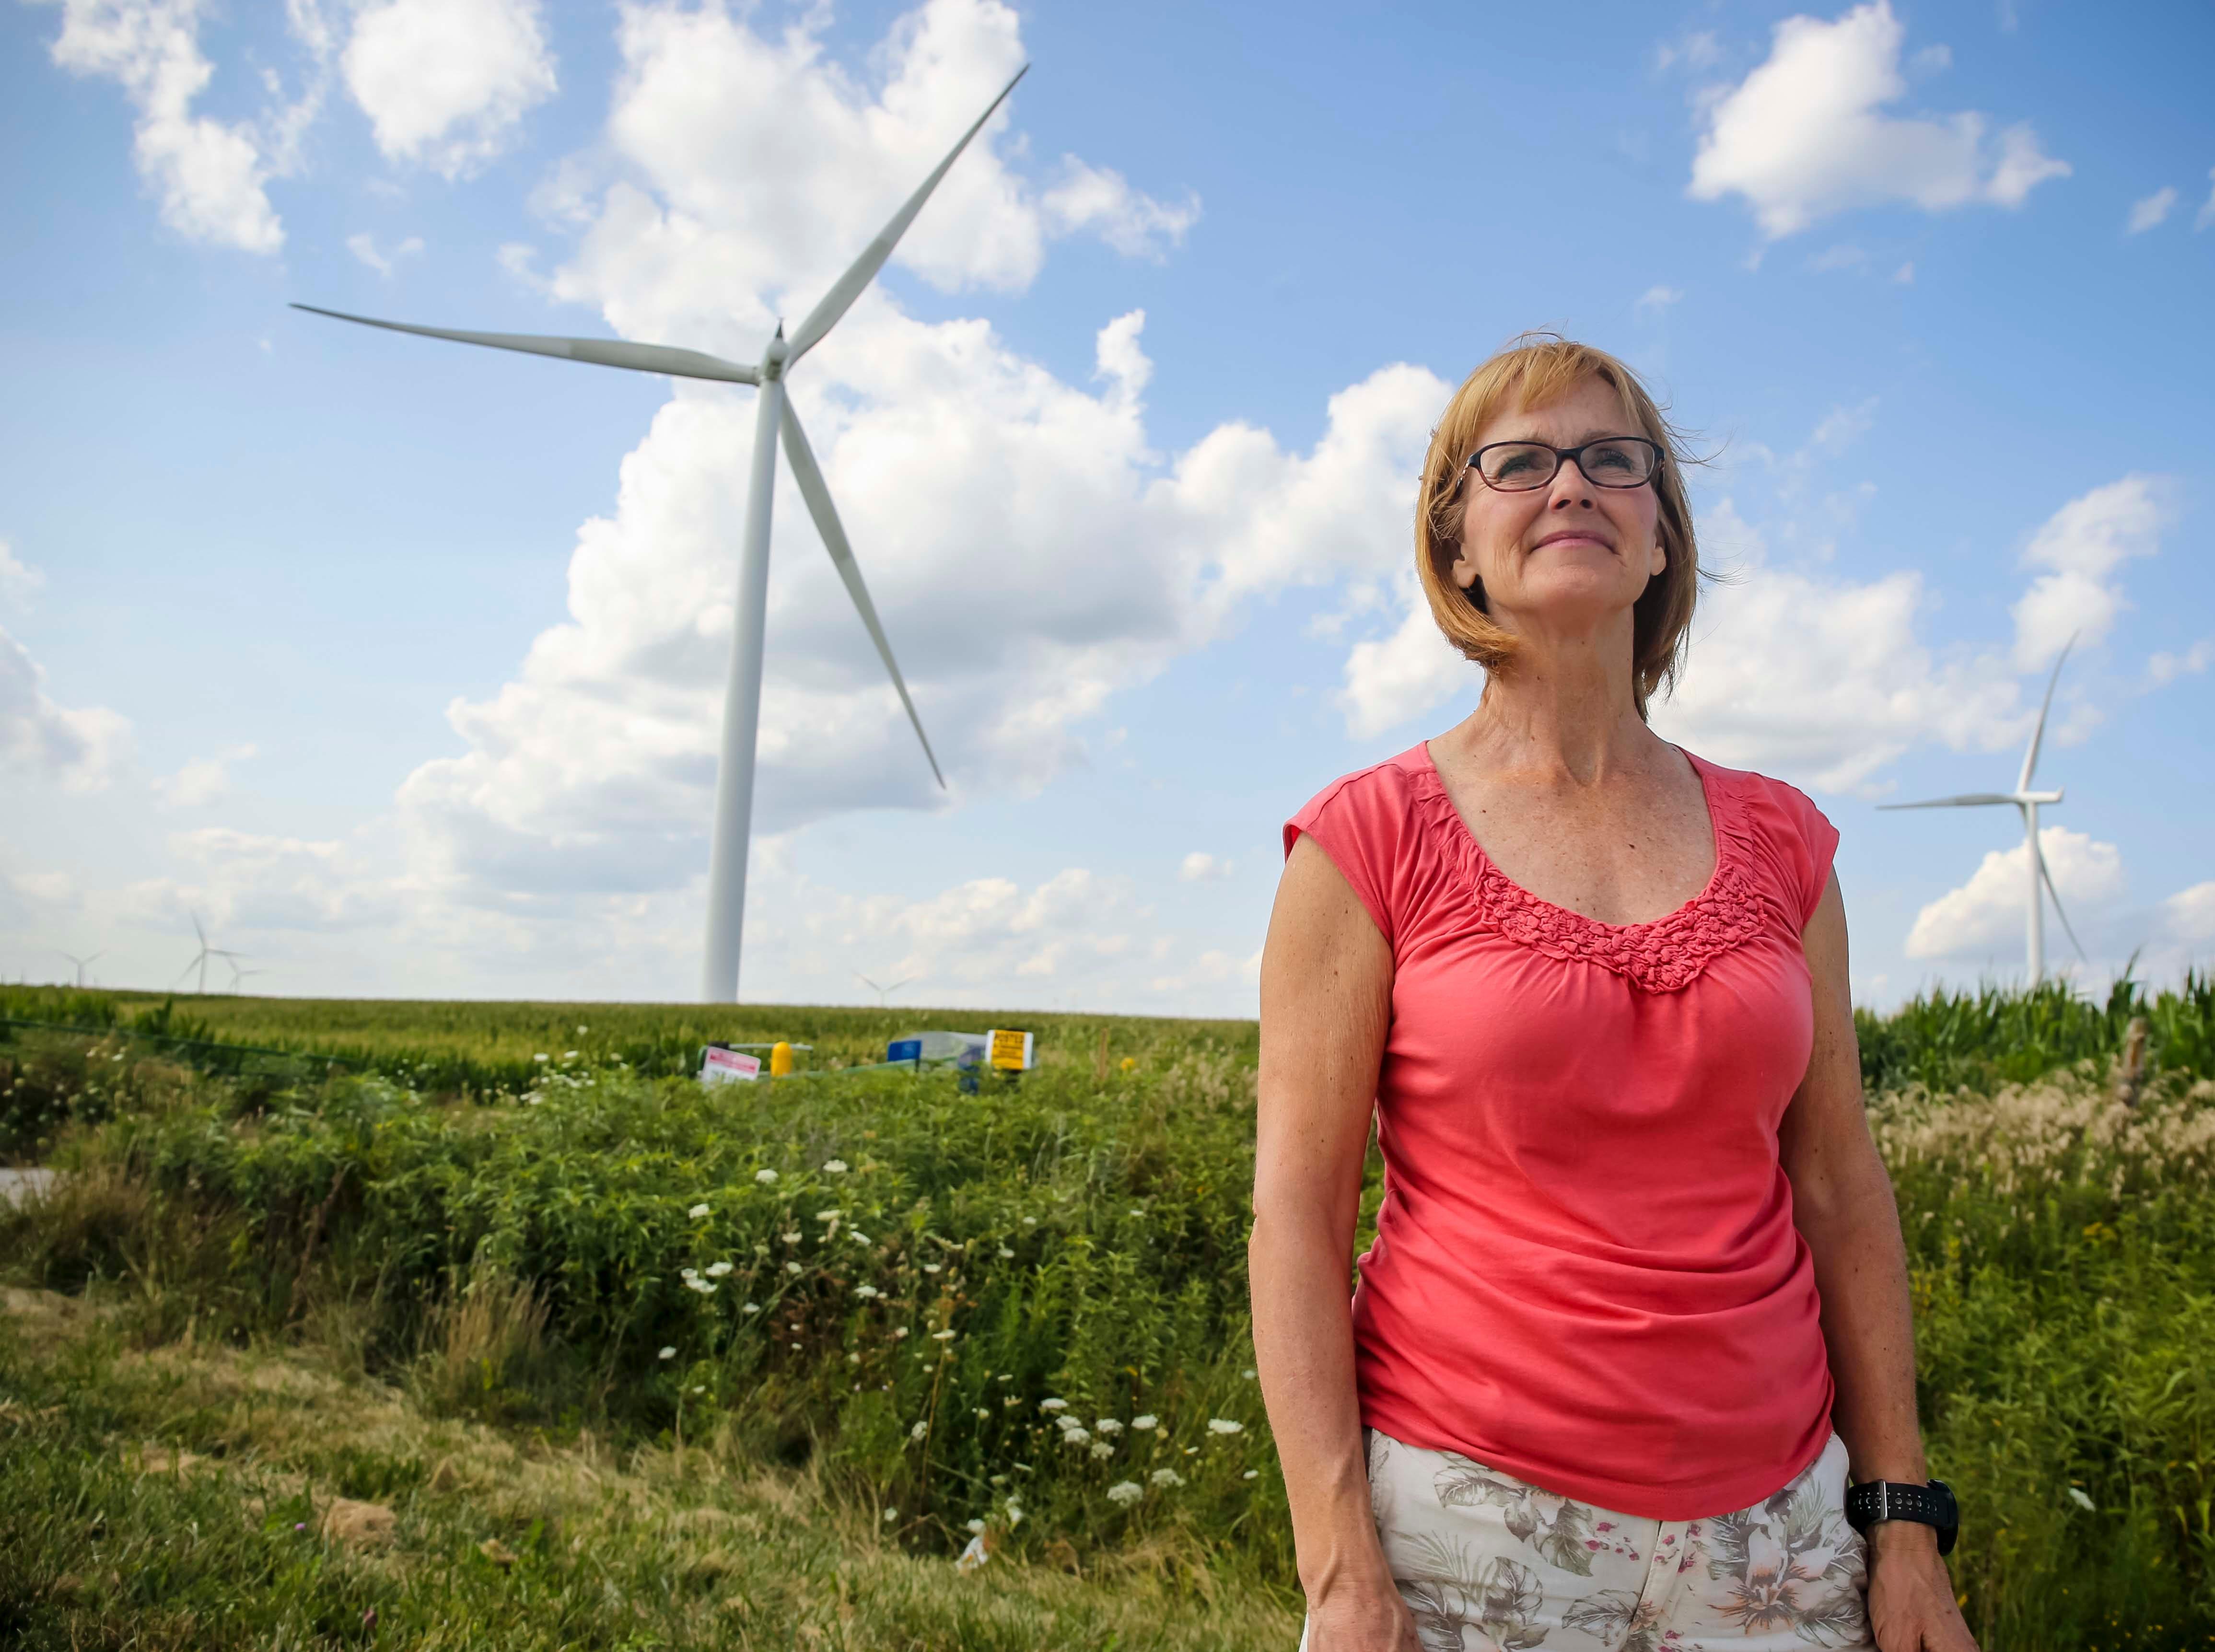 Ronni Scott of rural Earlham near a  MidAmerican Energy wind turbine farm near Macksburg, Iowa, Friday, July 27, 2018.